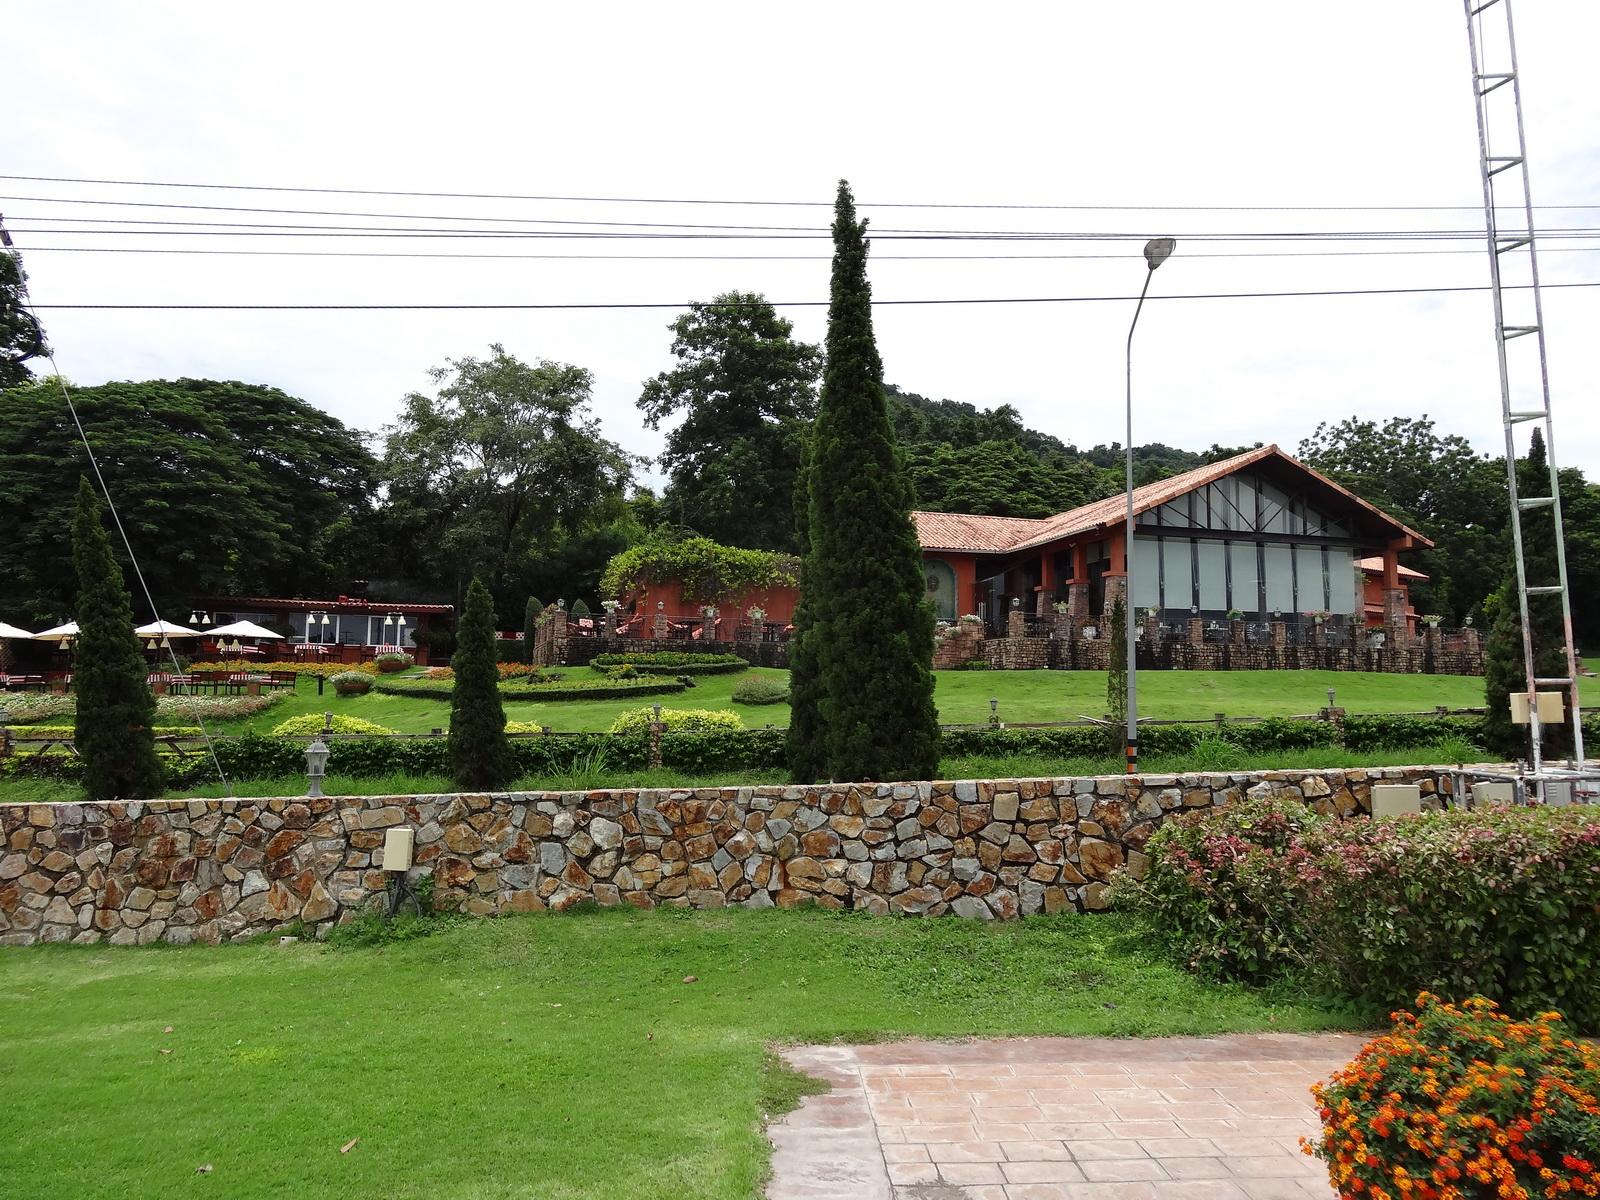 30 Pattaya 148